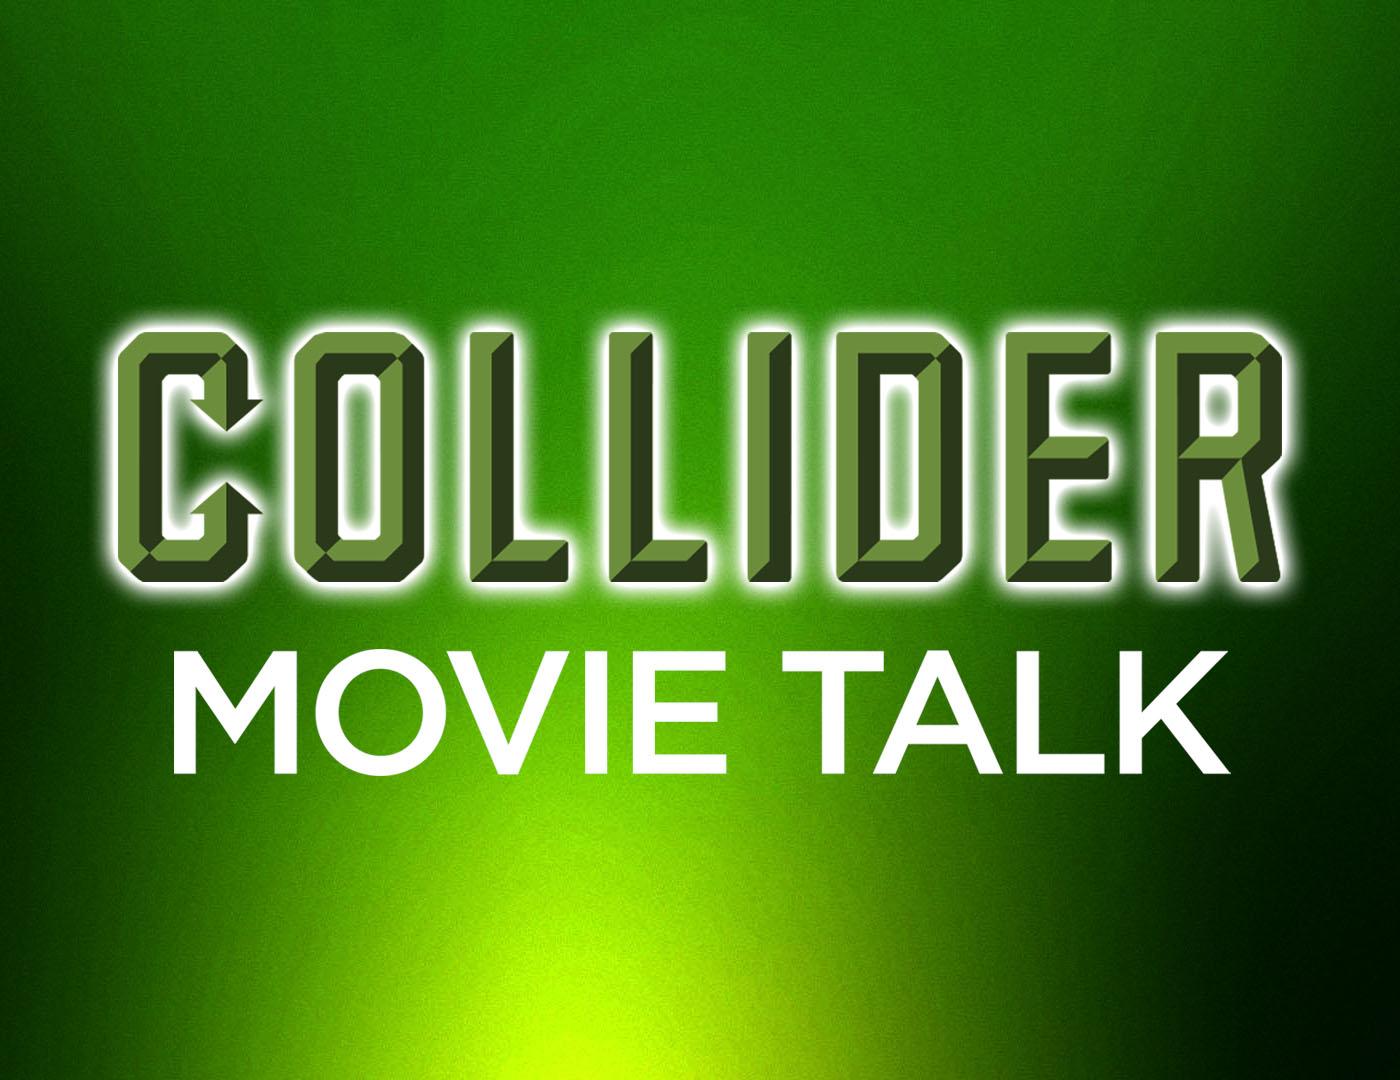 Justice League, Wonder Woman, Doctor Strange Comic Con Trailers & More - Collider Movie Talk